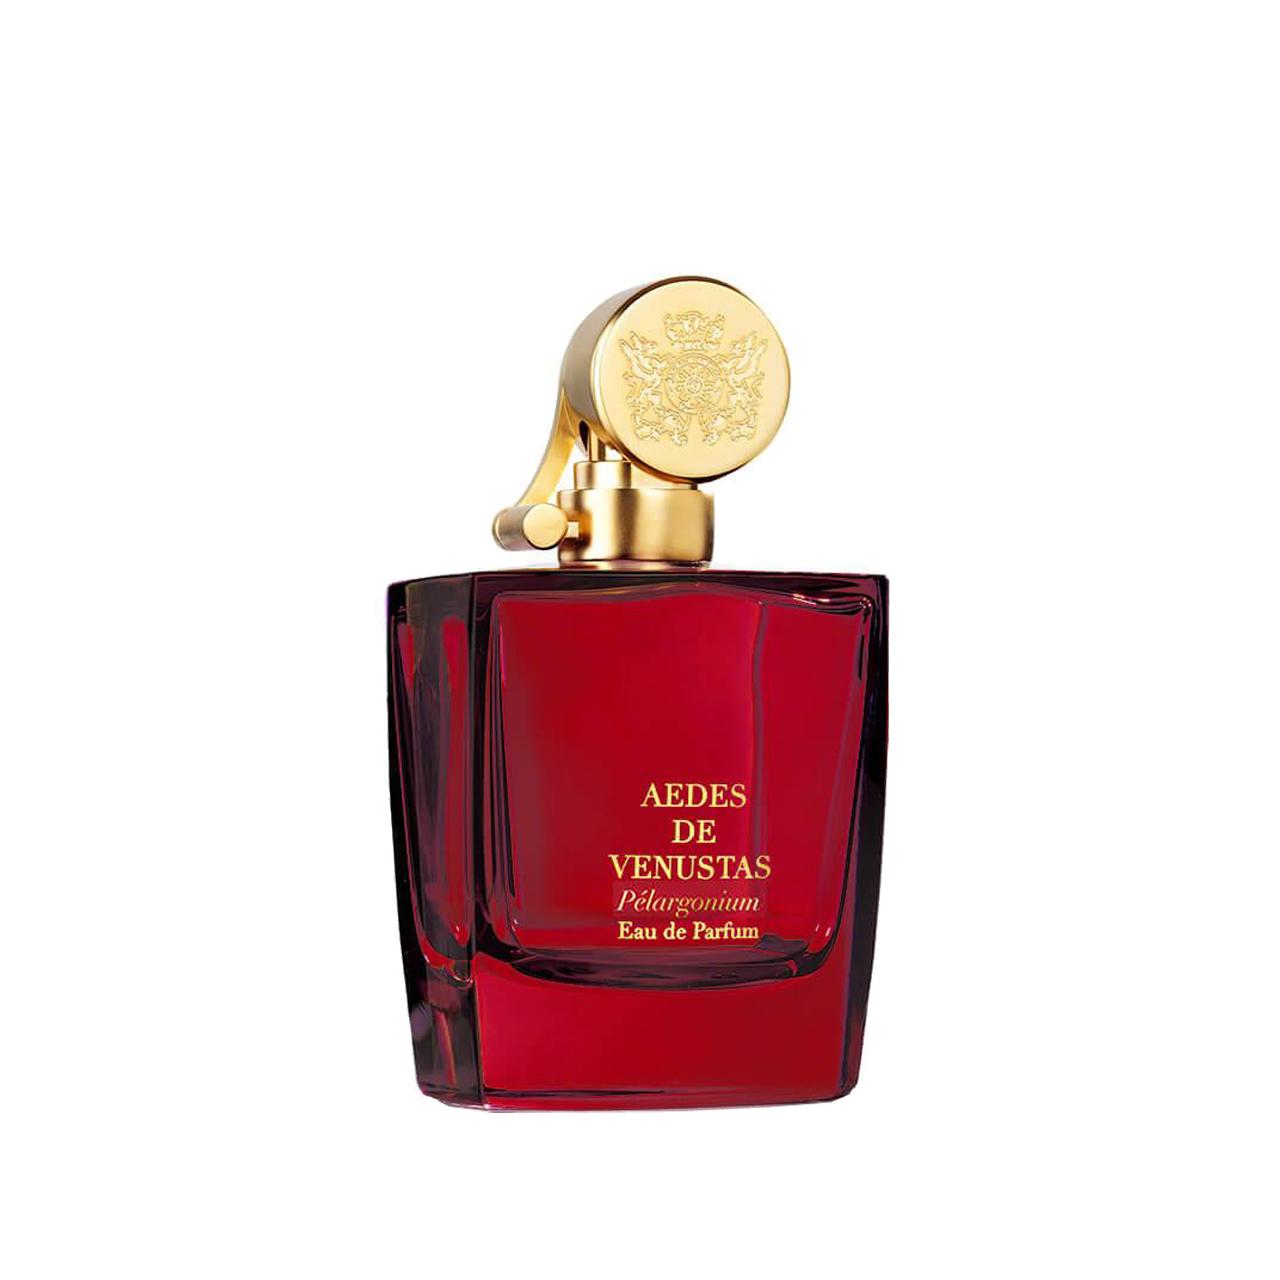 Pelargonium - Eau de Parfum